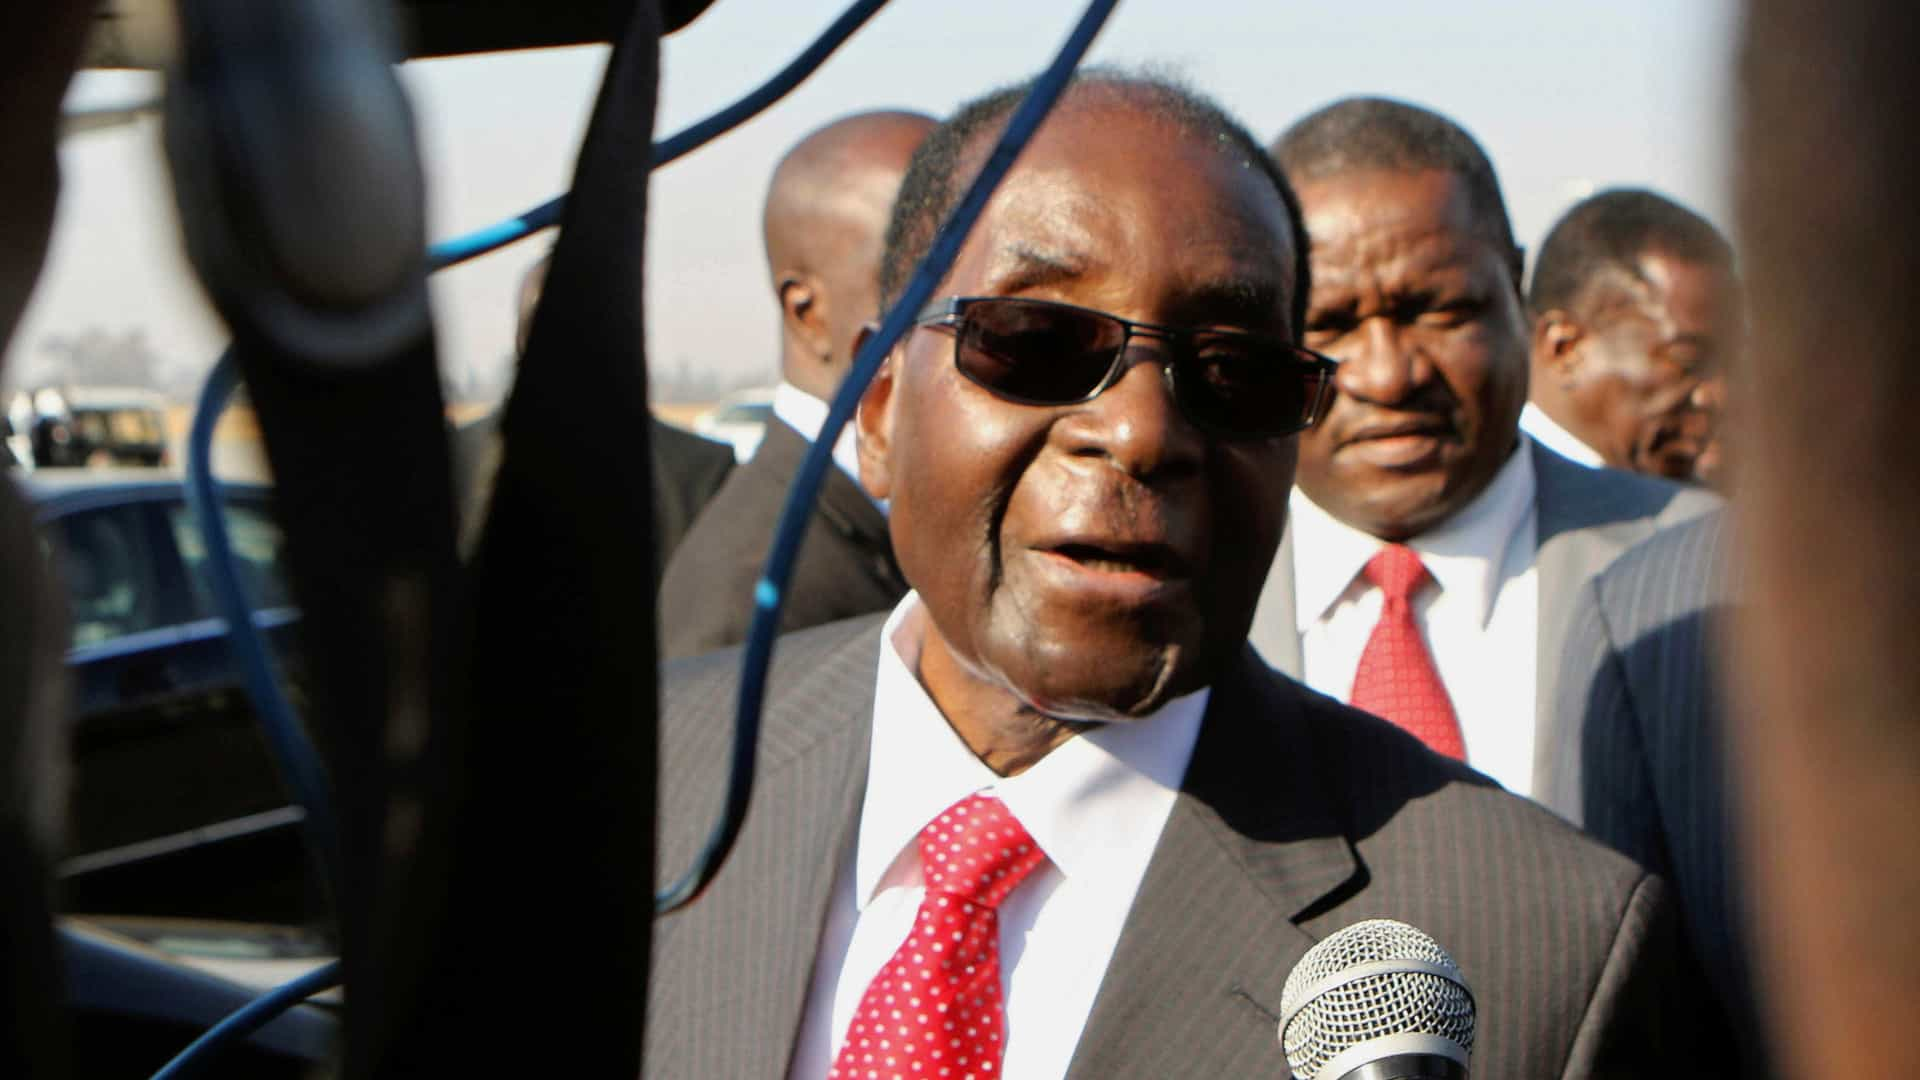 Robert Mugabe aceita resignar ao cargo de presidente. Carta está assinada